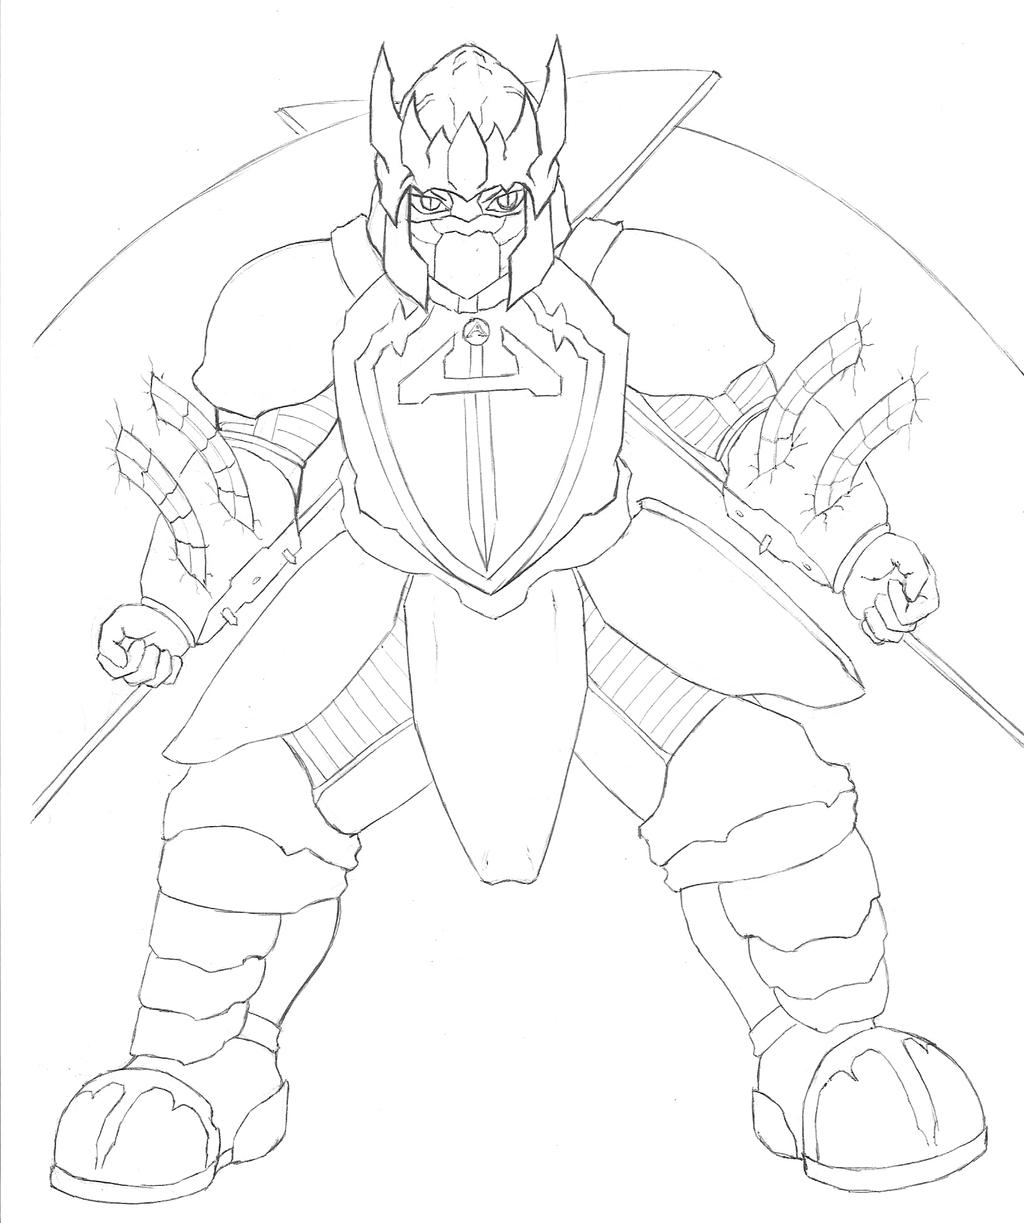 aegis vanguard sketch 2 by teramaster on deviantart